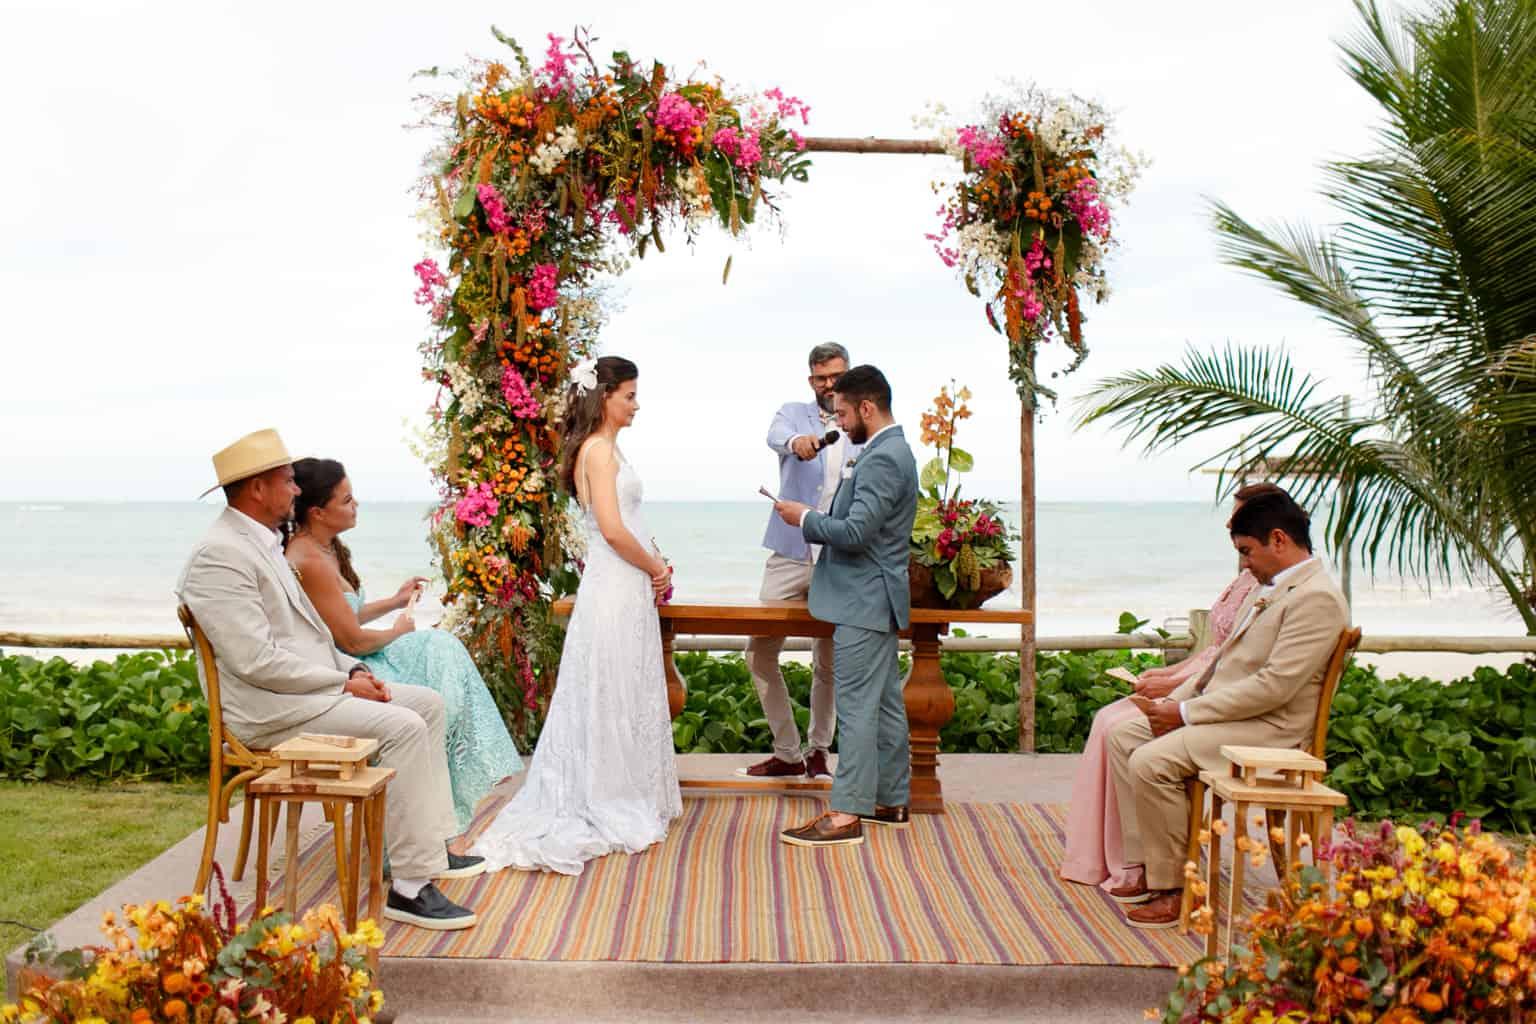 Casamento-Emanuelle-e-Alysson-Fotografia-Tadeu-Nanó-e-Luca-Antunes107